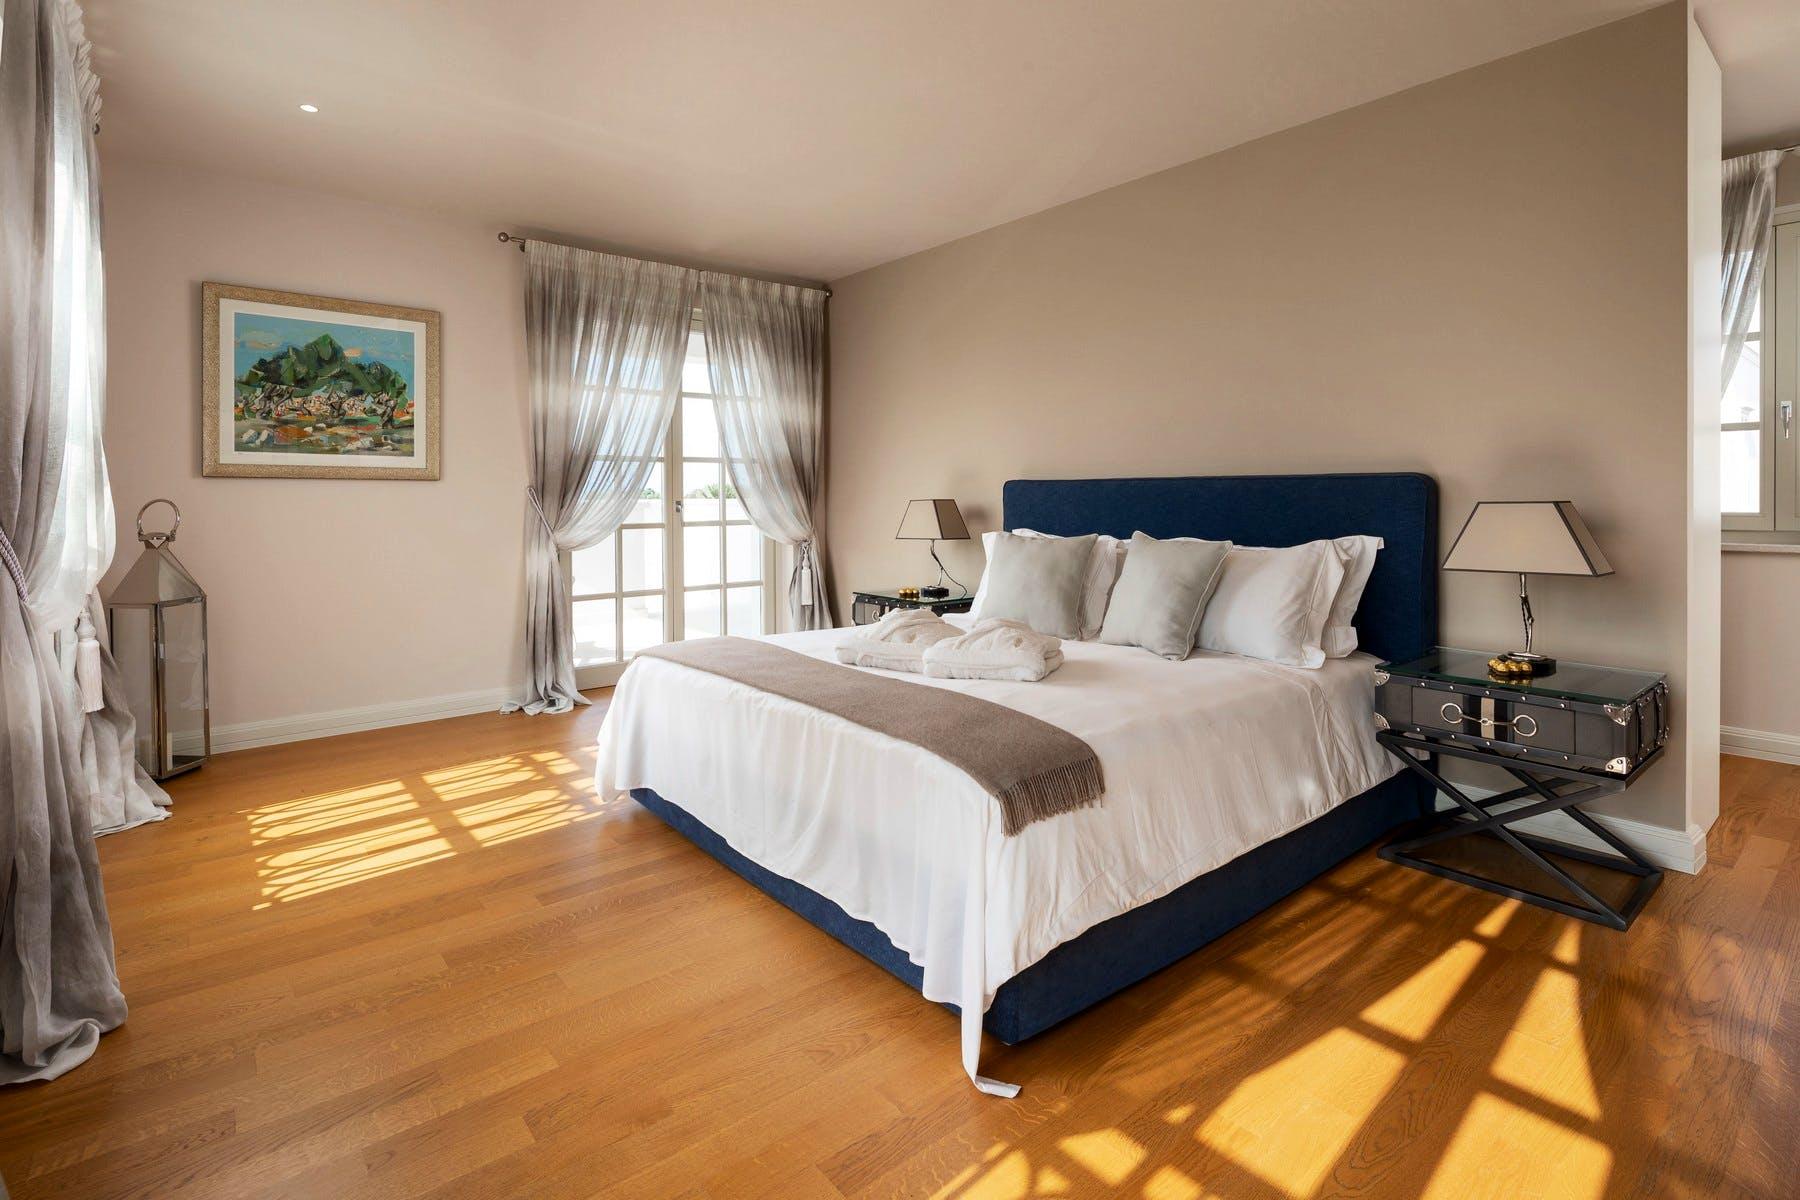 Double bedroom with adjoining bathroom